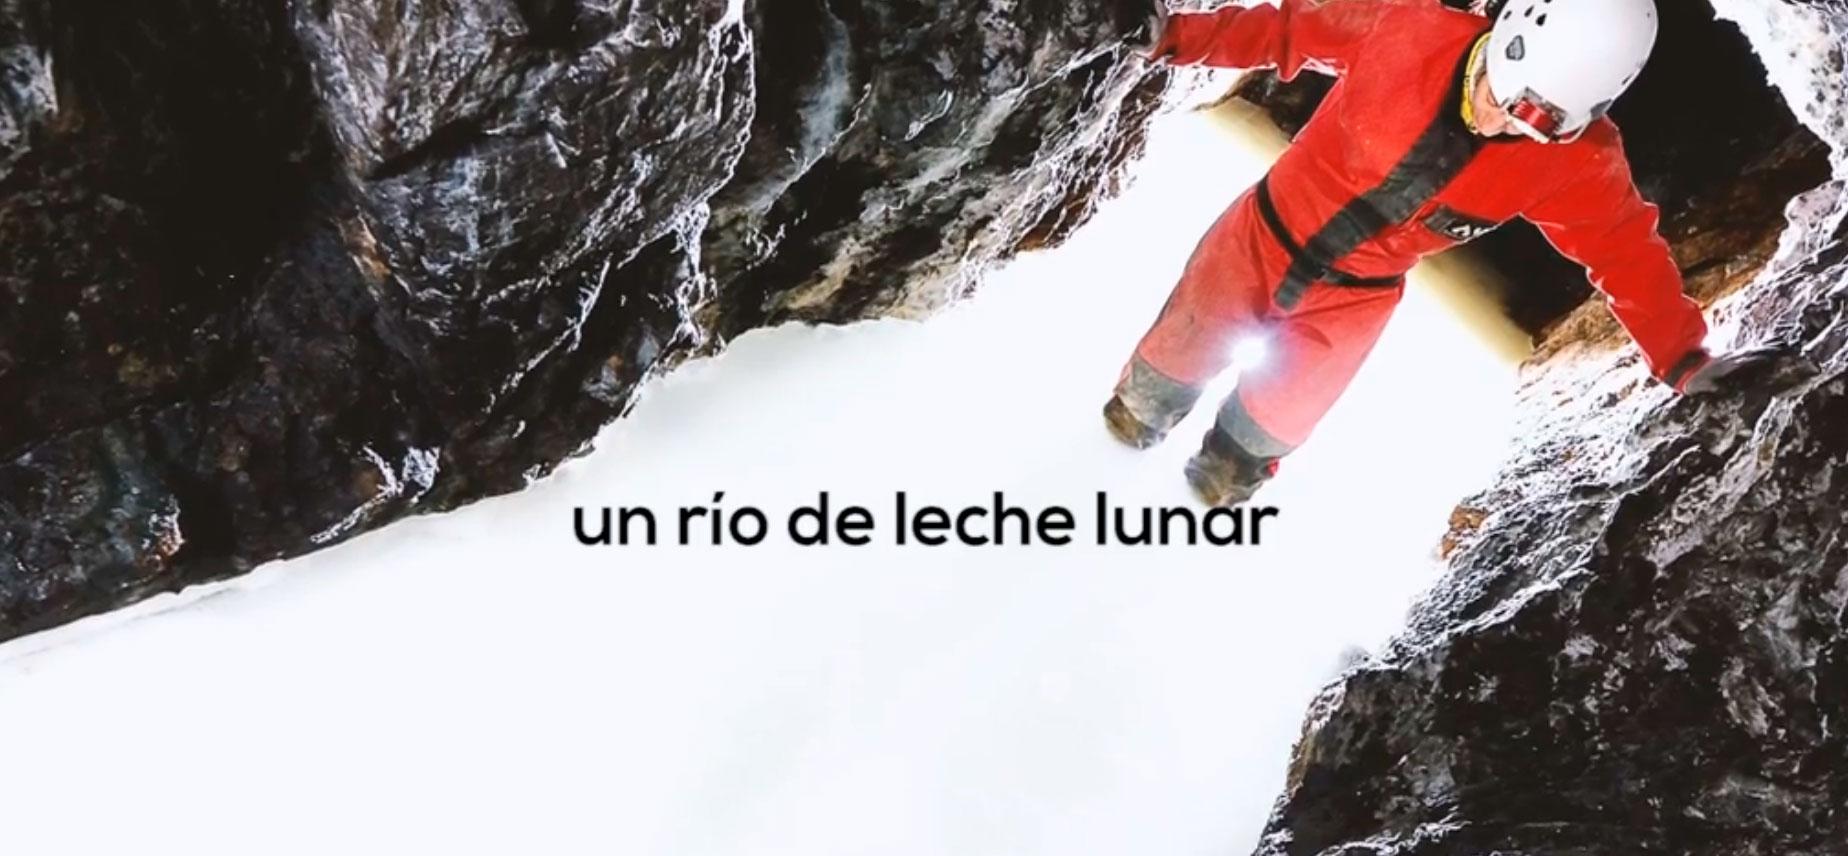 El Rio de Leche Lunar vasco